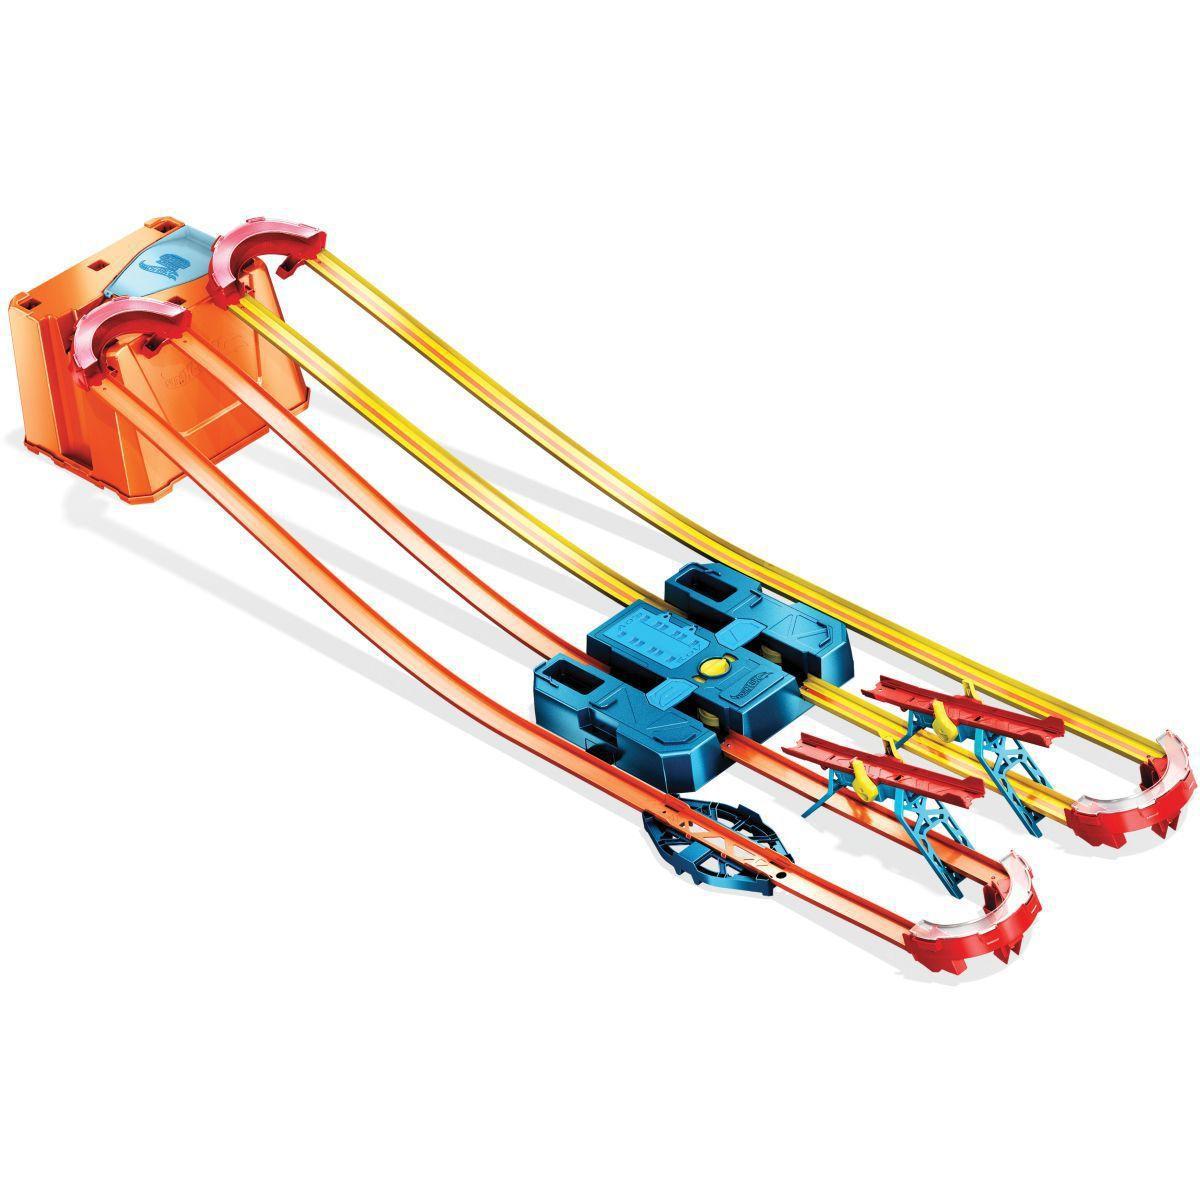 Hot Wheels Track builder - Power Boost Box - Mattel